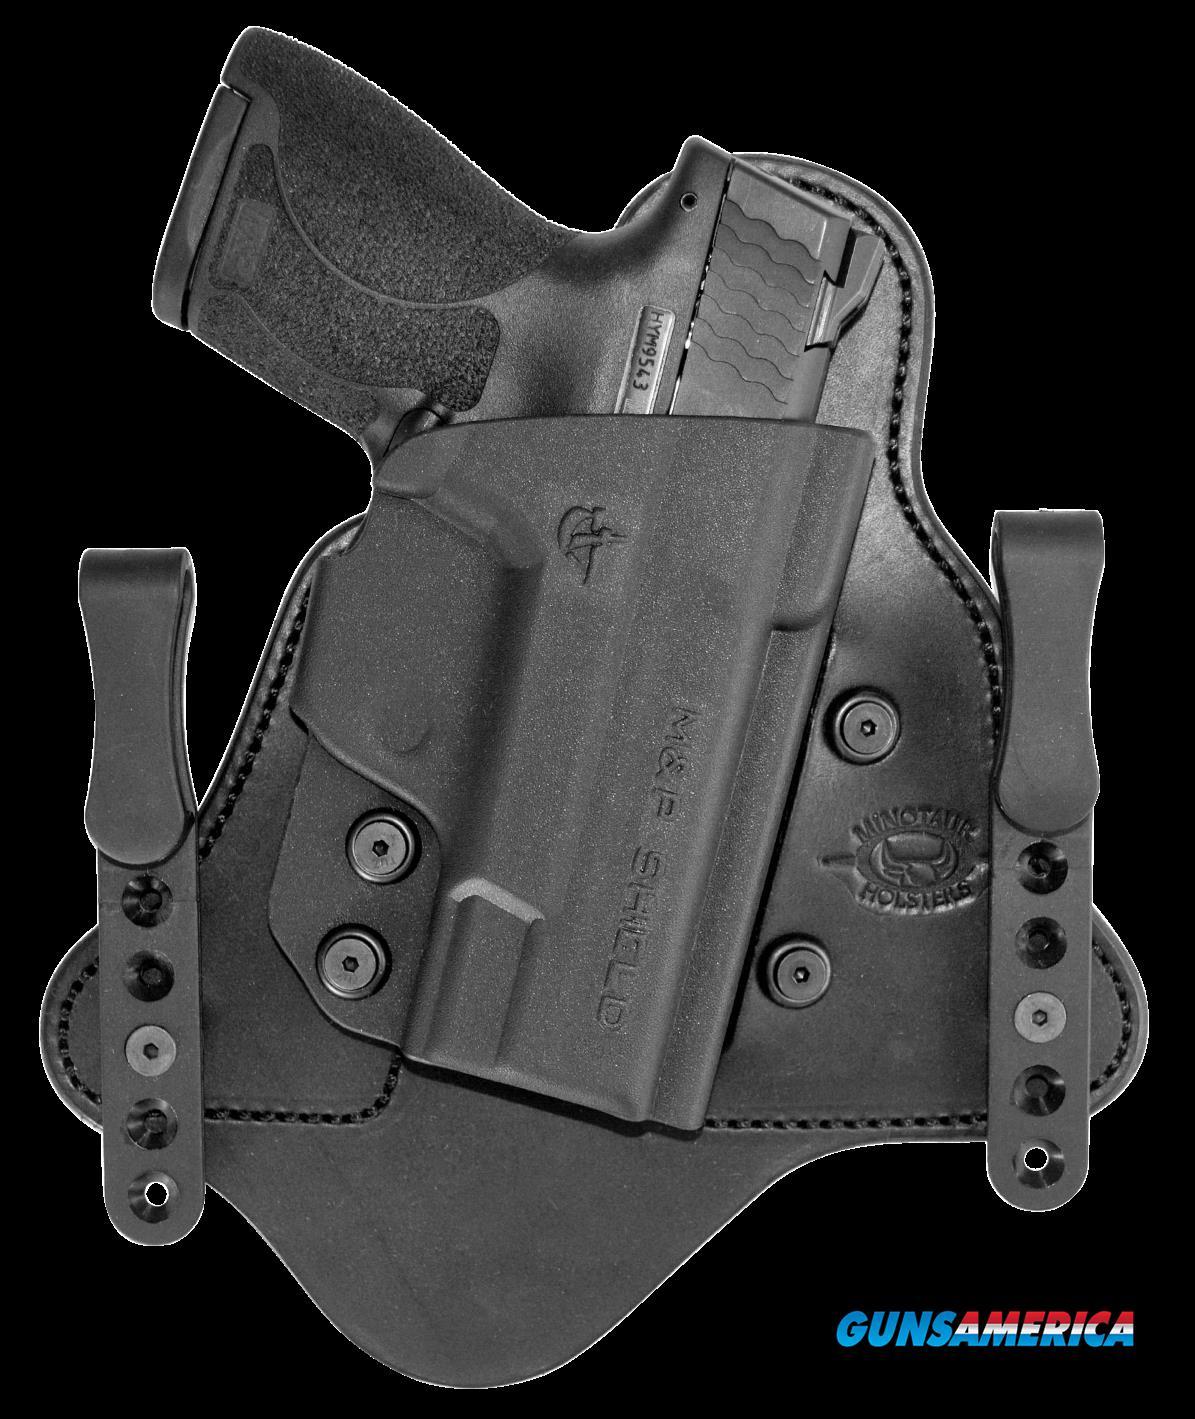 Comp-tac Mtac, Comptac Mtac Iwb Hybrid Holstr S&w Shield Ez 380  Guns > Pistols > 1911 Pistol Copies (non-Colt)